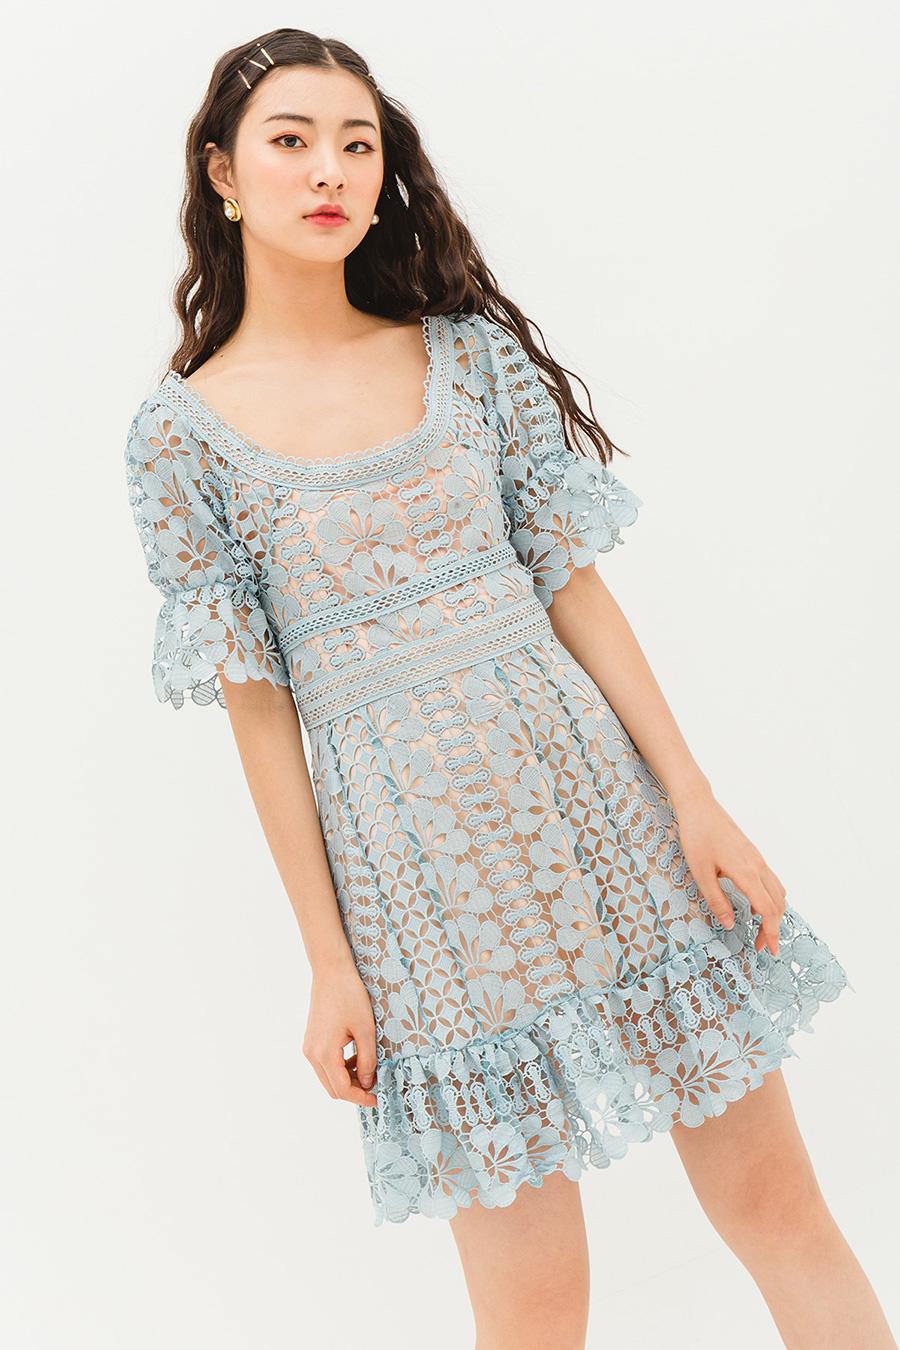 LILA DRESS - LAKE BLUE